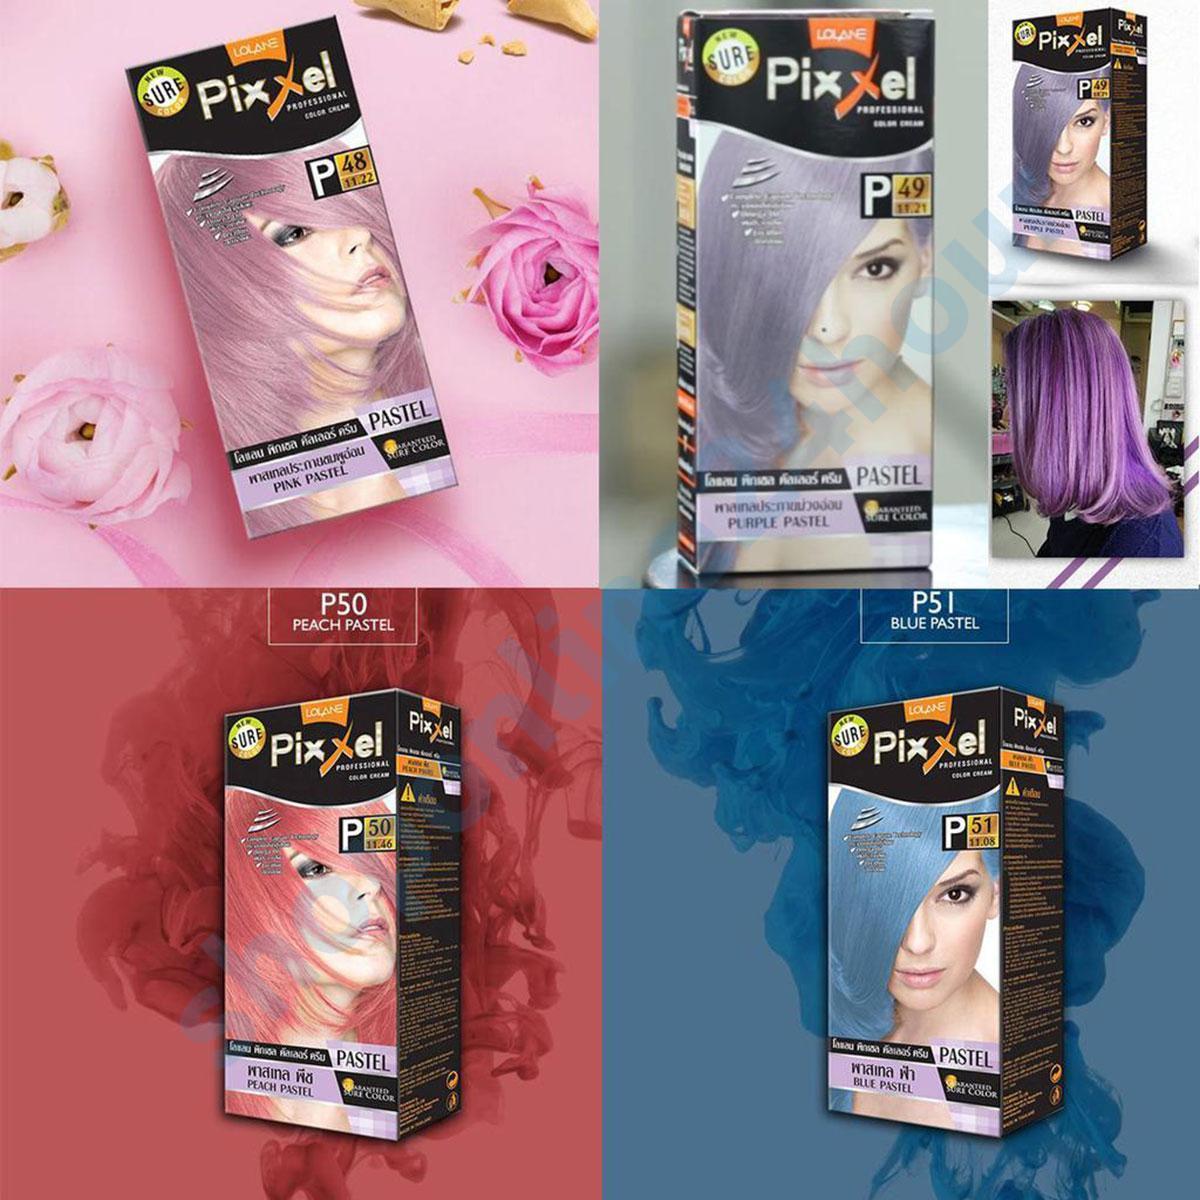 Kết quả hình ảnh cho lolane pixxel purple pastel